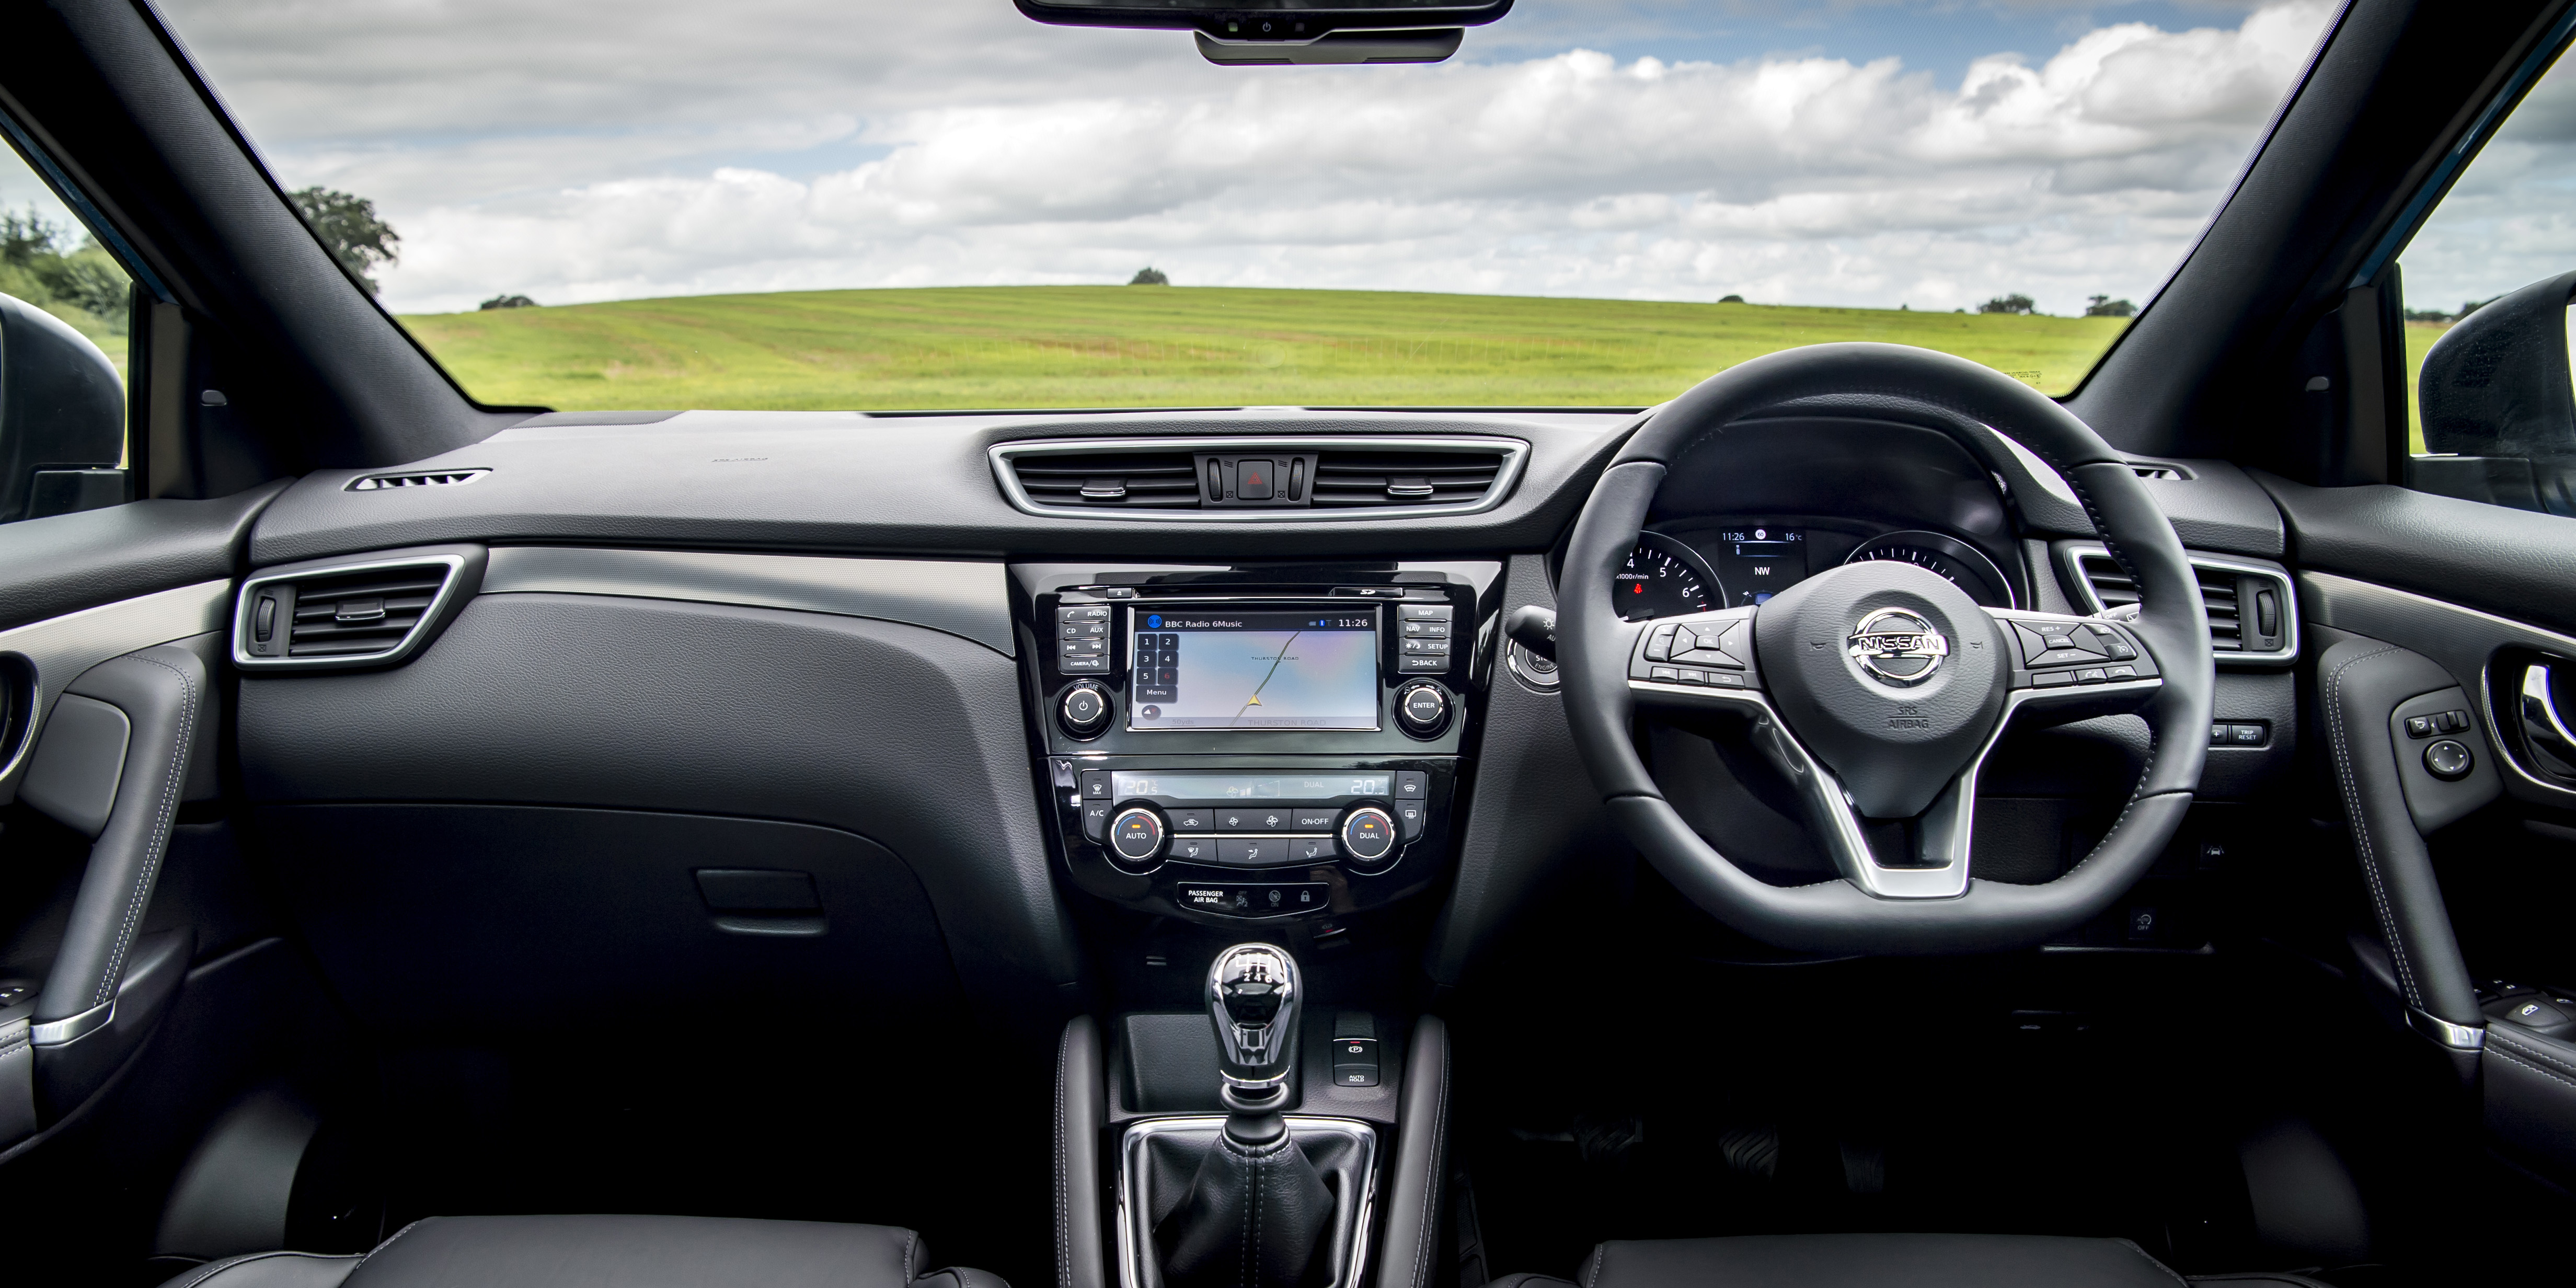 Nissan Qashqai Interior & Infotainment | carwow